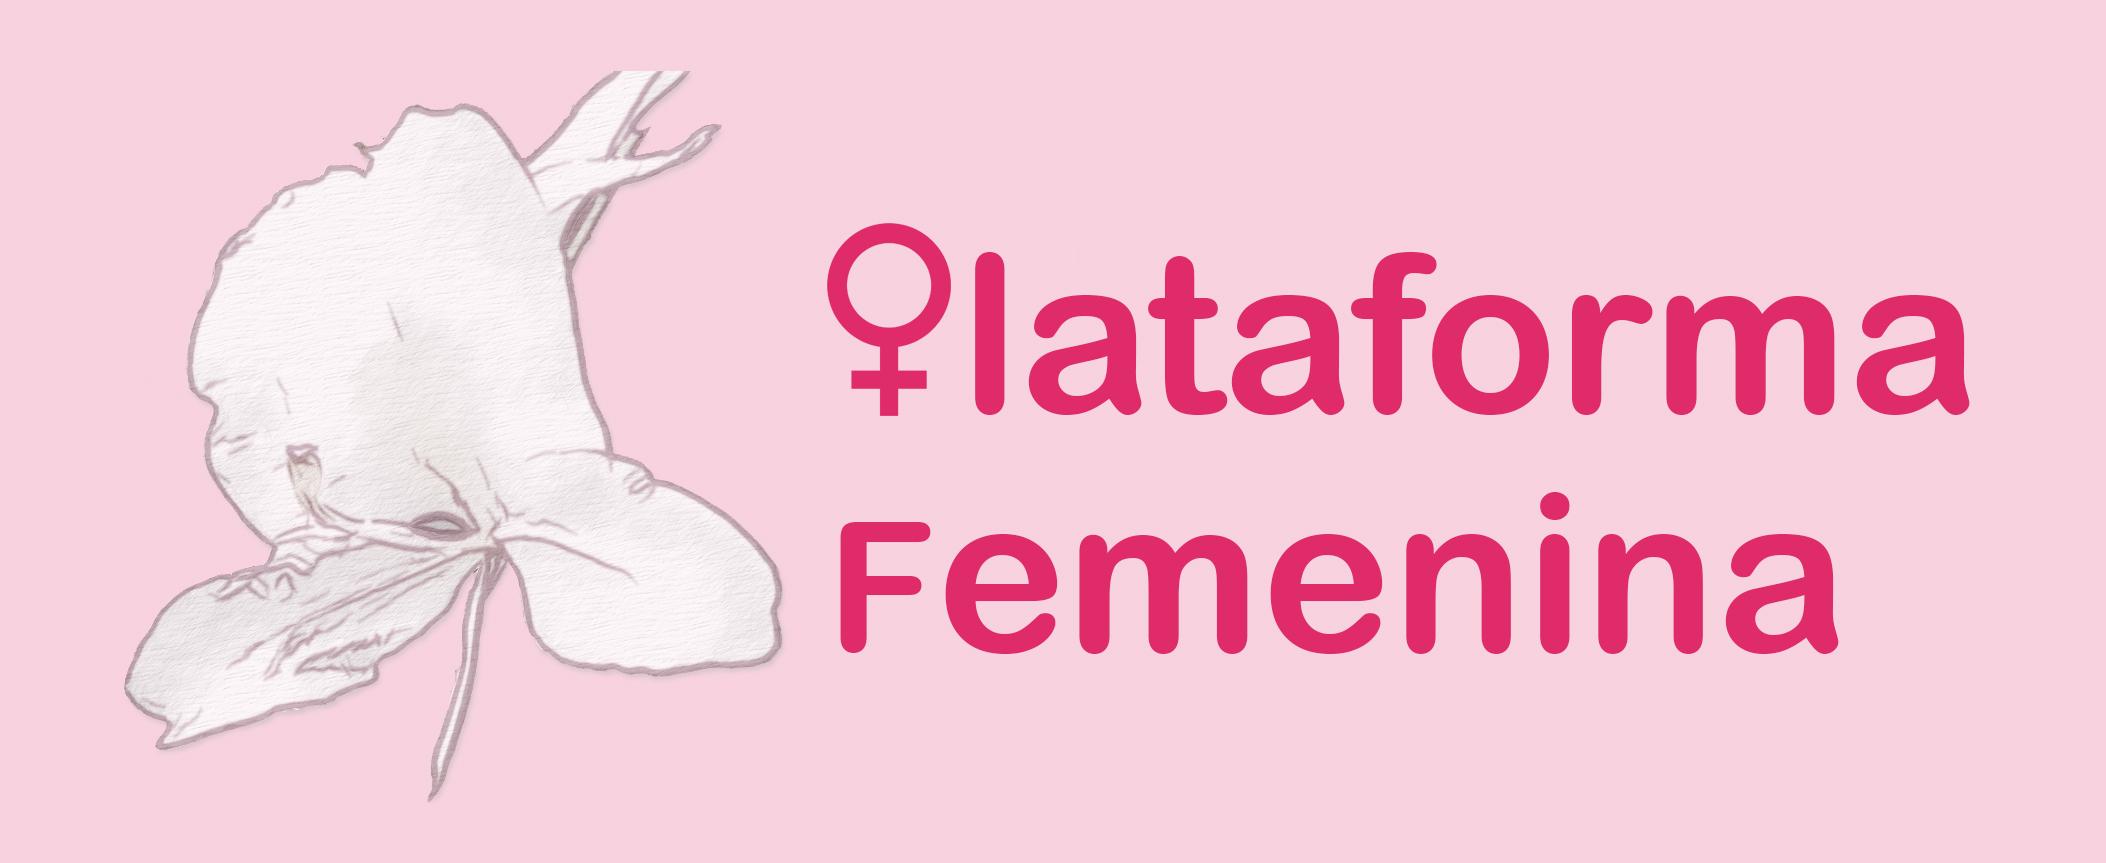 Plataforma Femenina